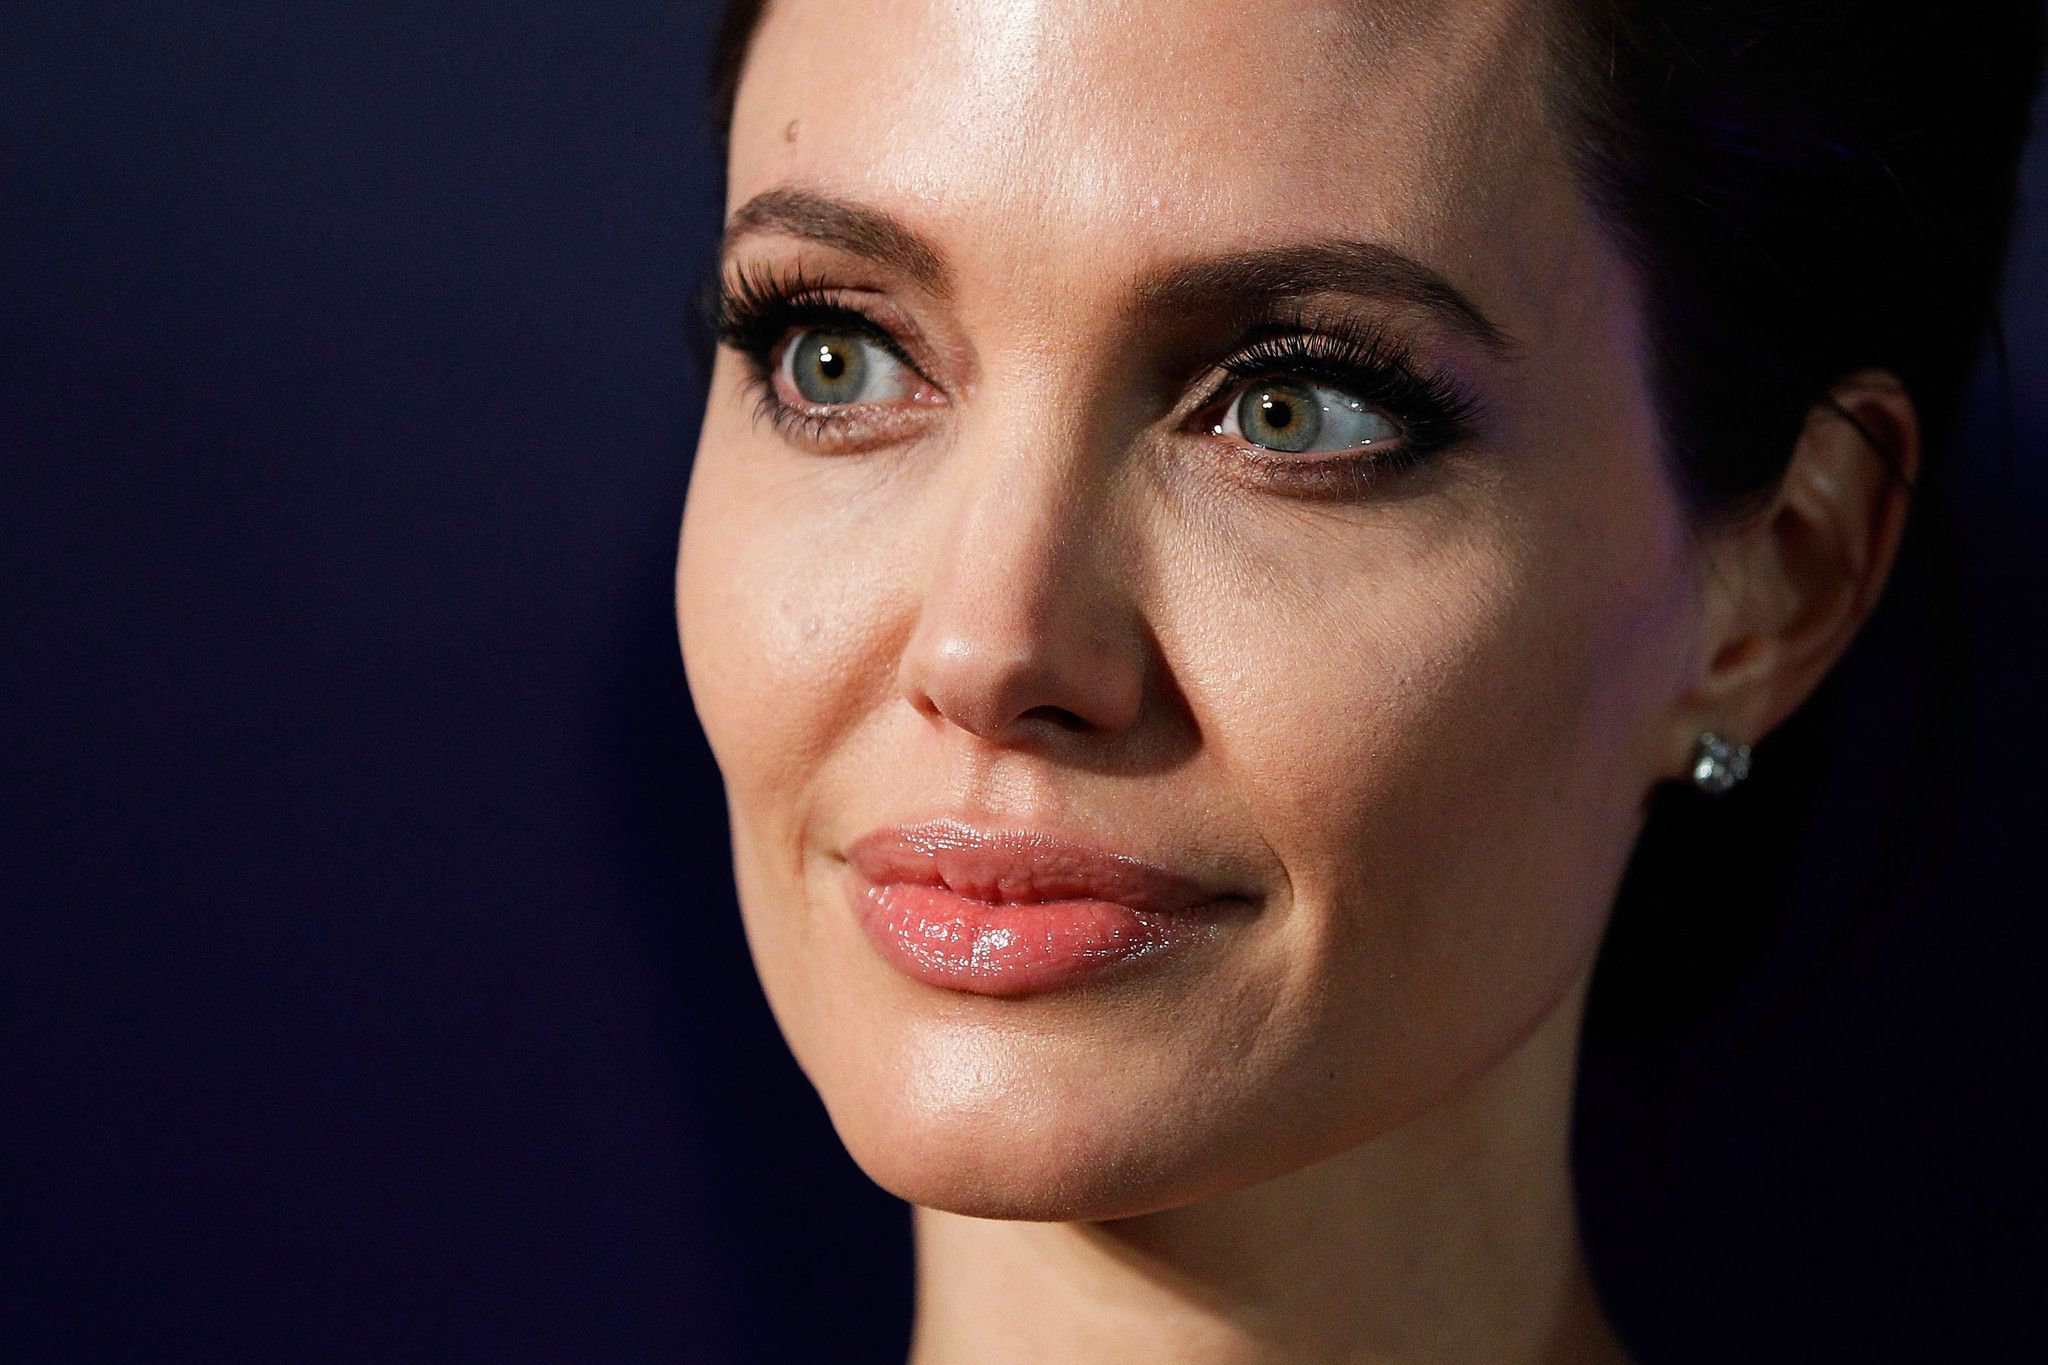 Angelina Jolie dimagrita e sciupata: per l'attrice scatta l'allarme anoressia